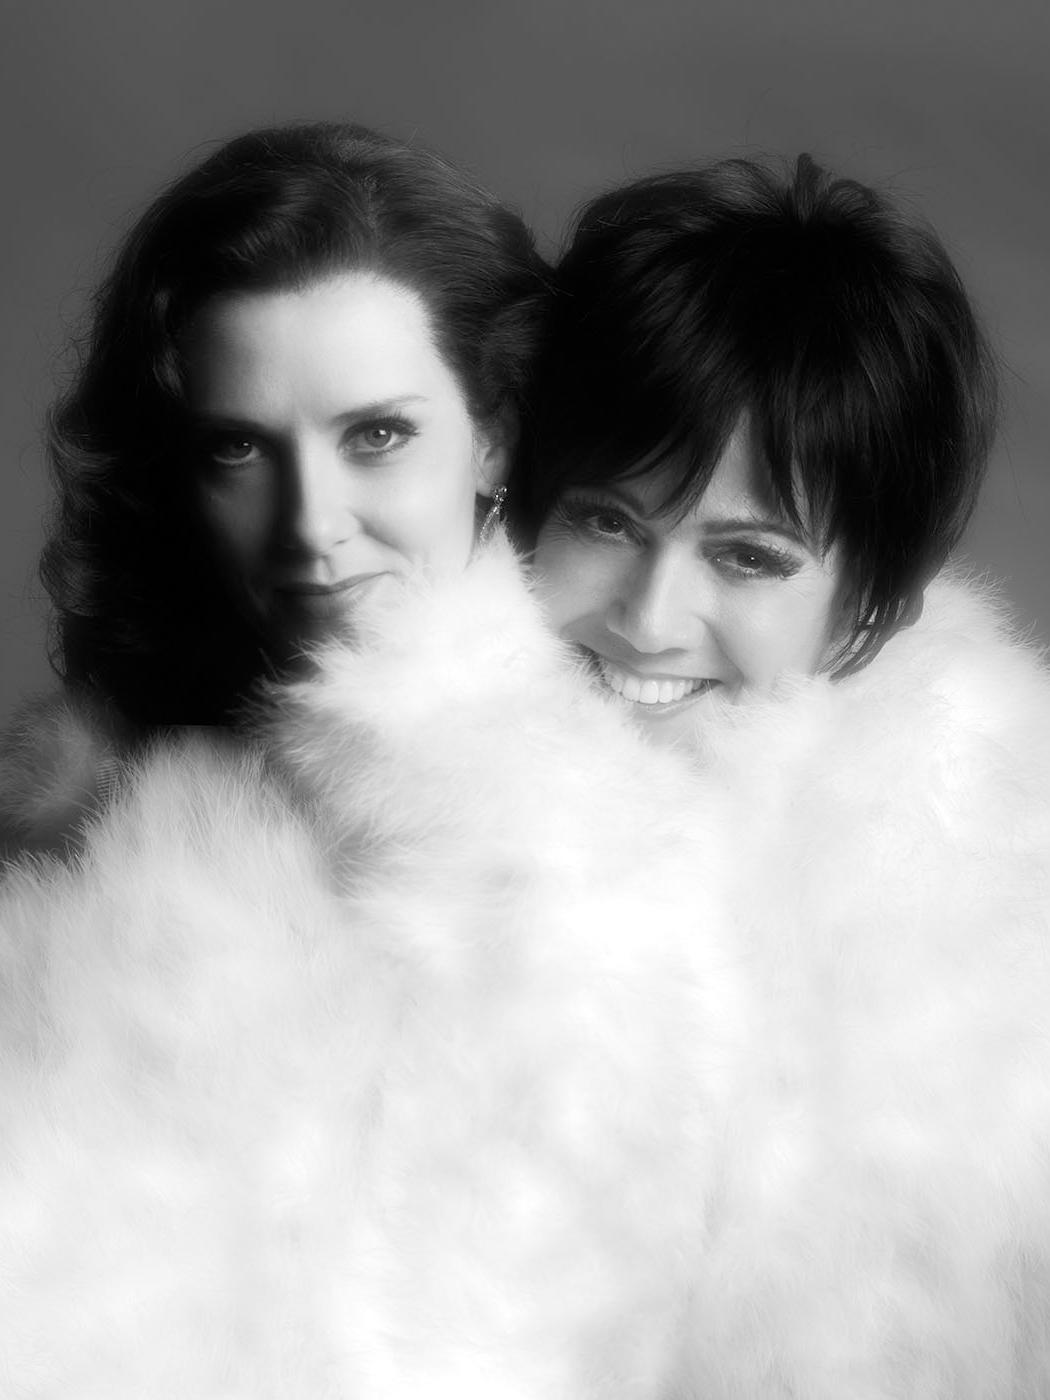 Garland & Minnelli